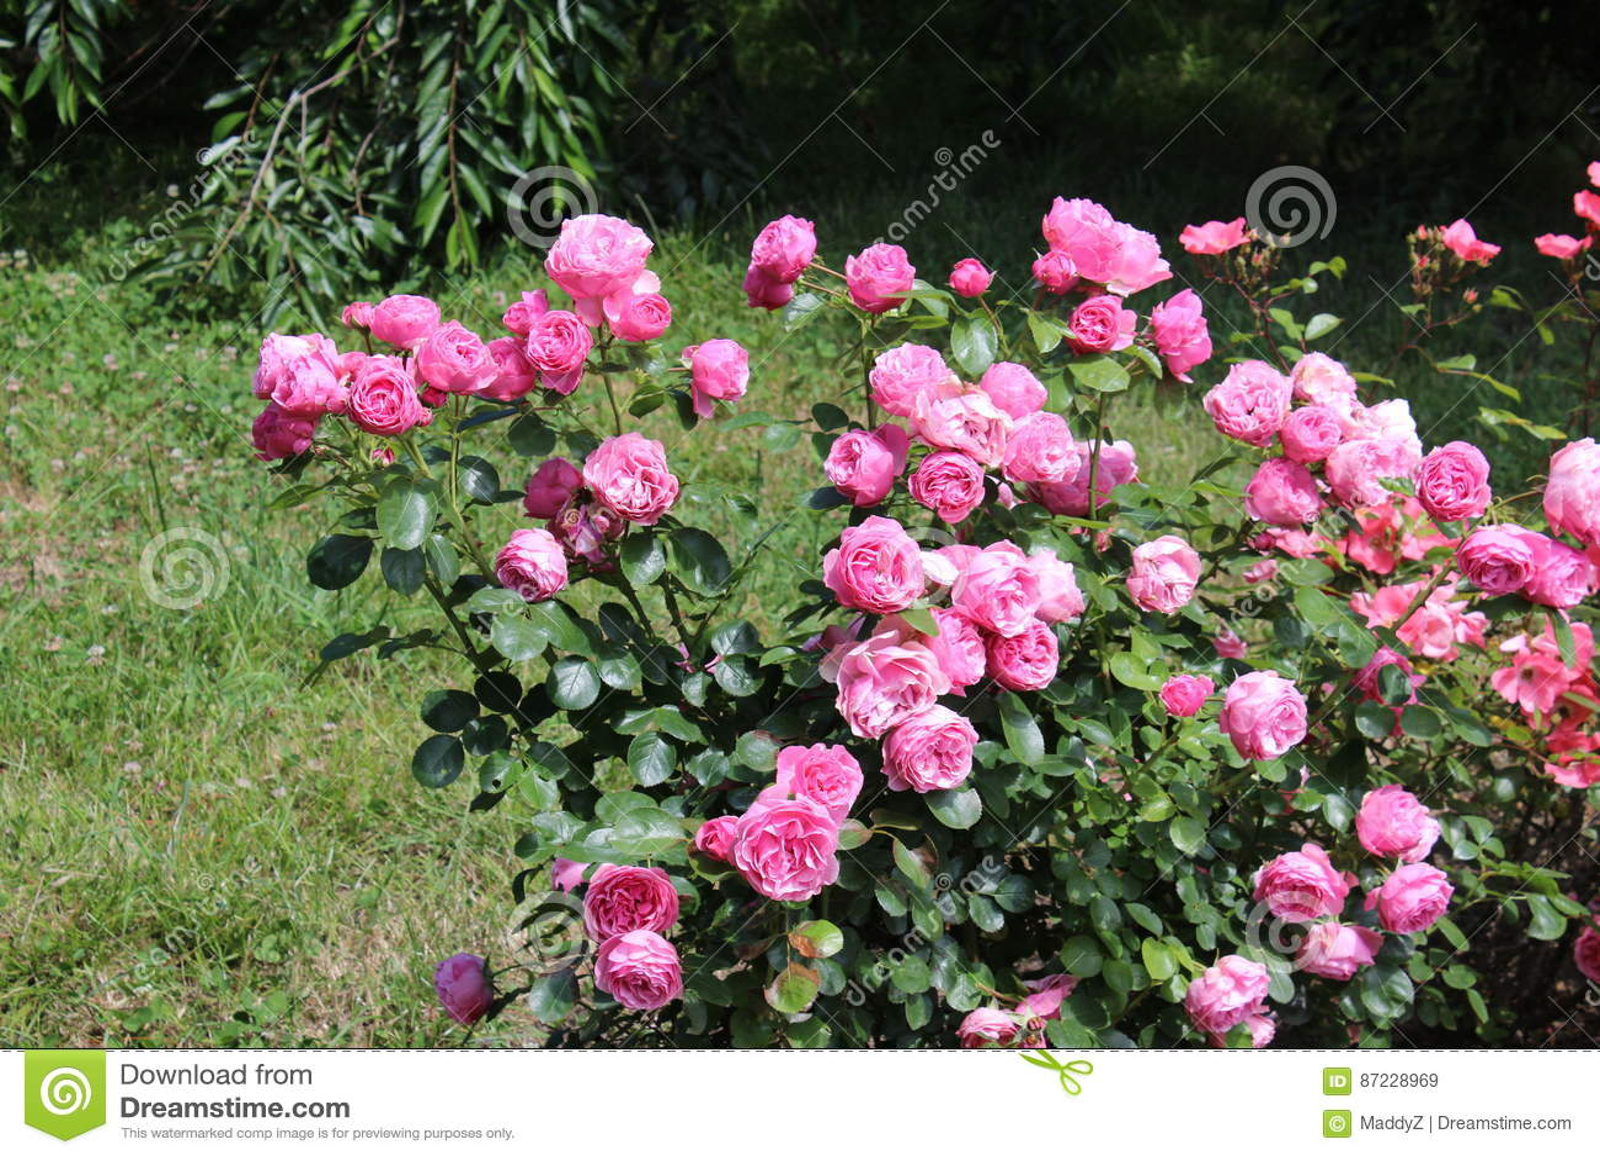 Rose Bush  Beautiful Pink Roses In A Garden Stock Image